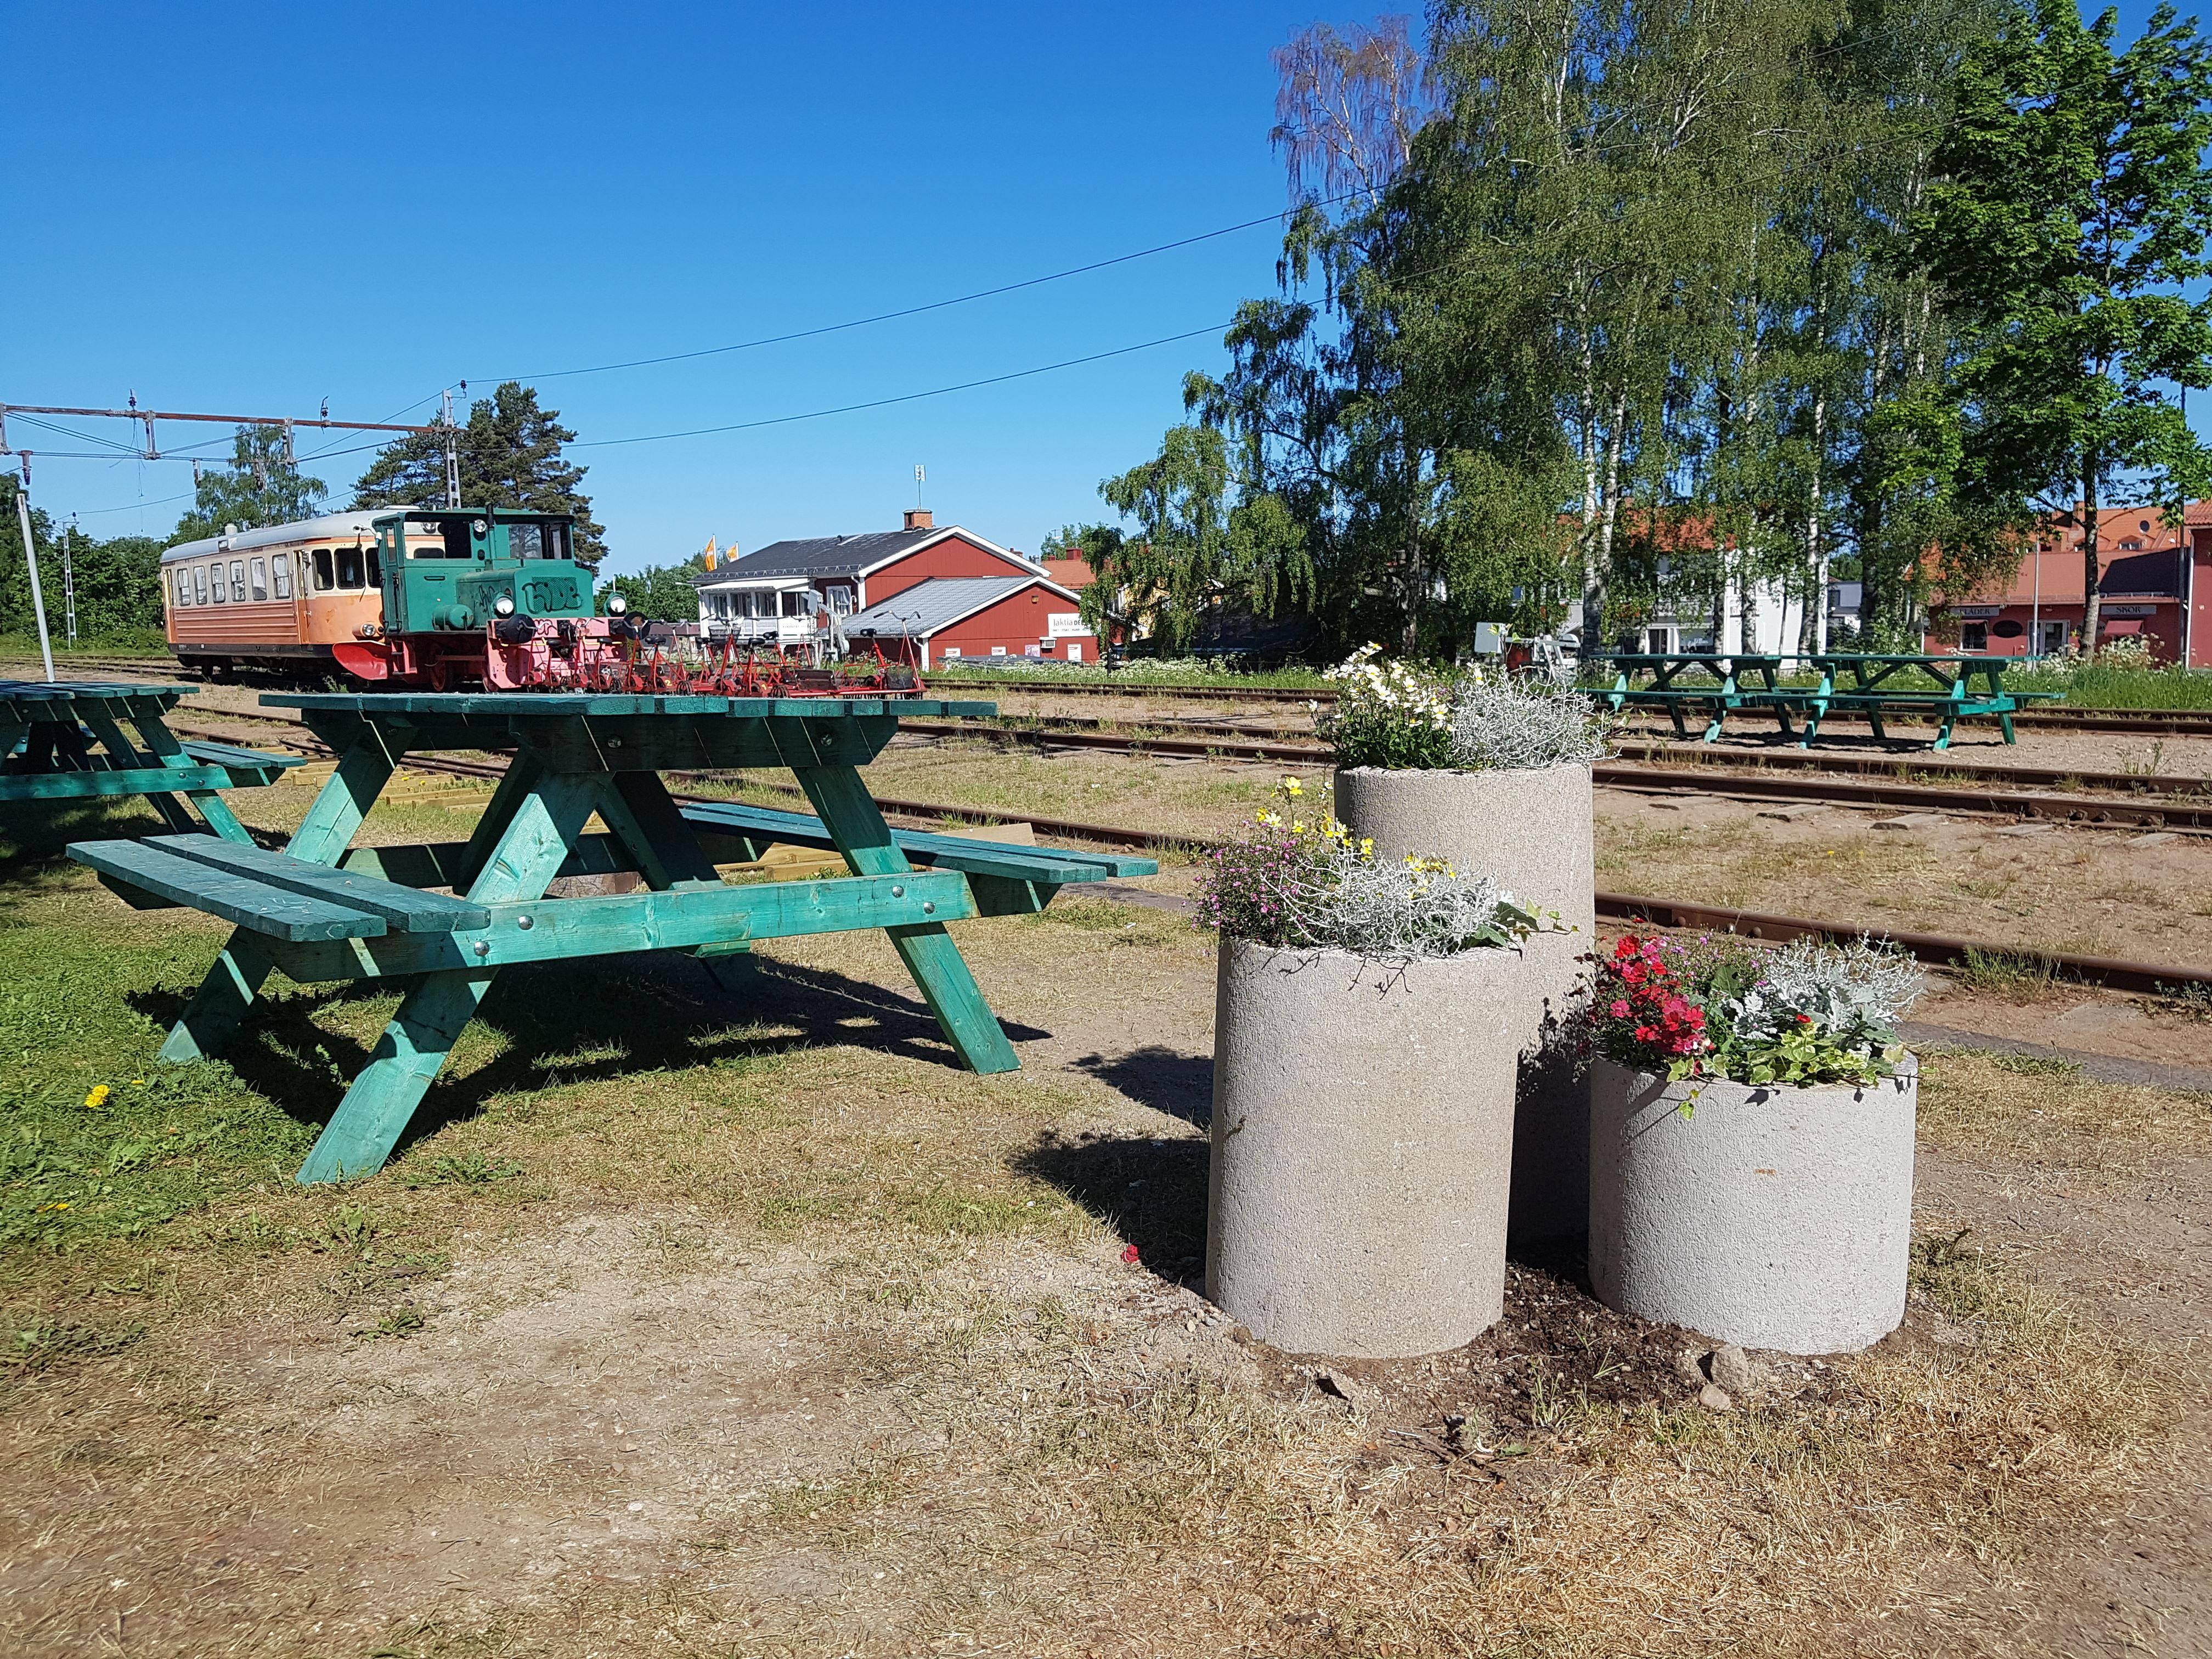 Delsbo stationcafé at the Dellen railroad